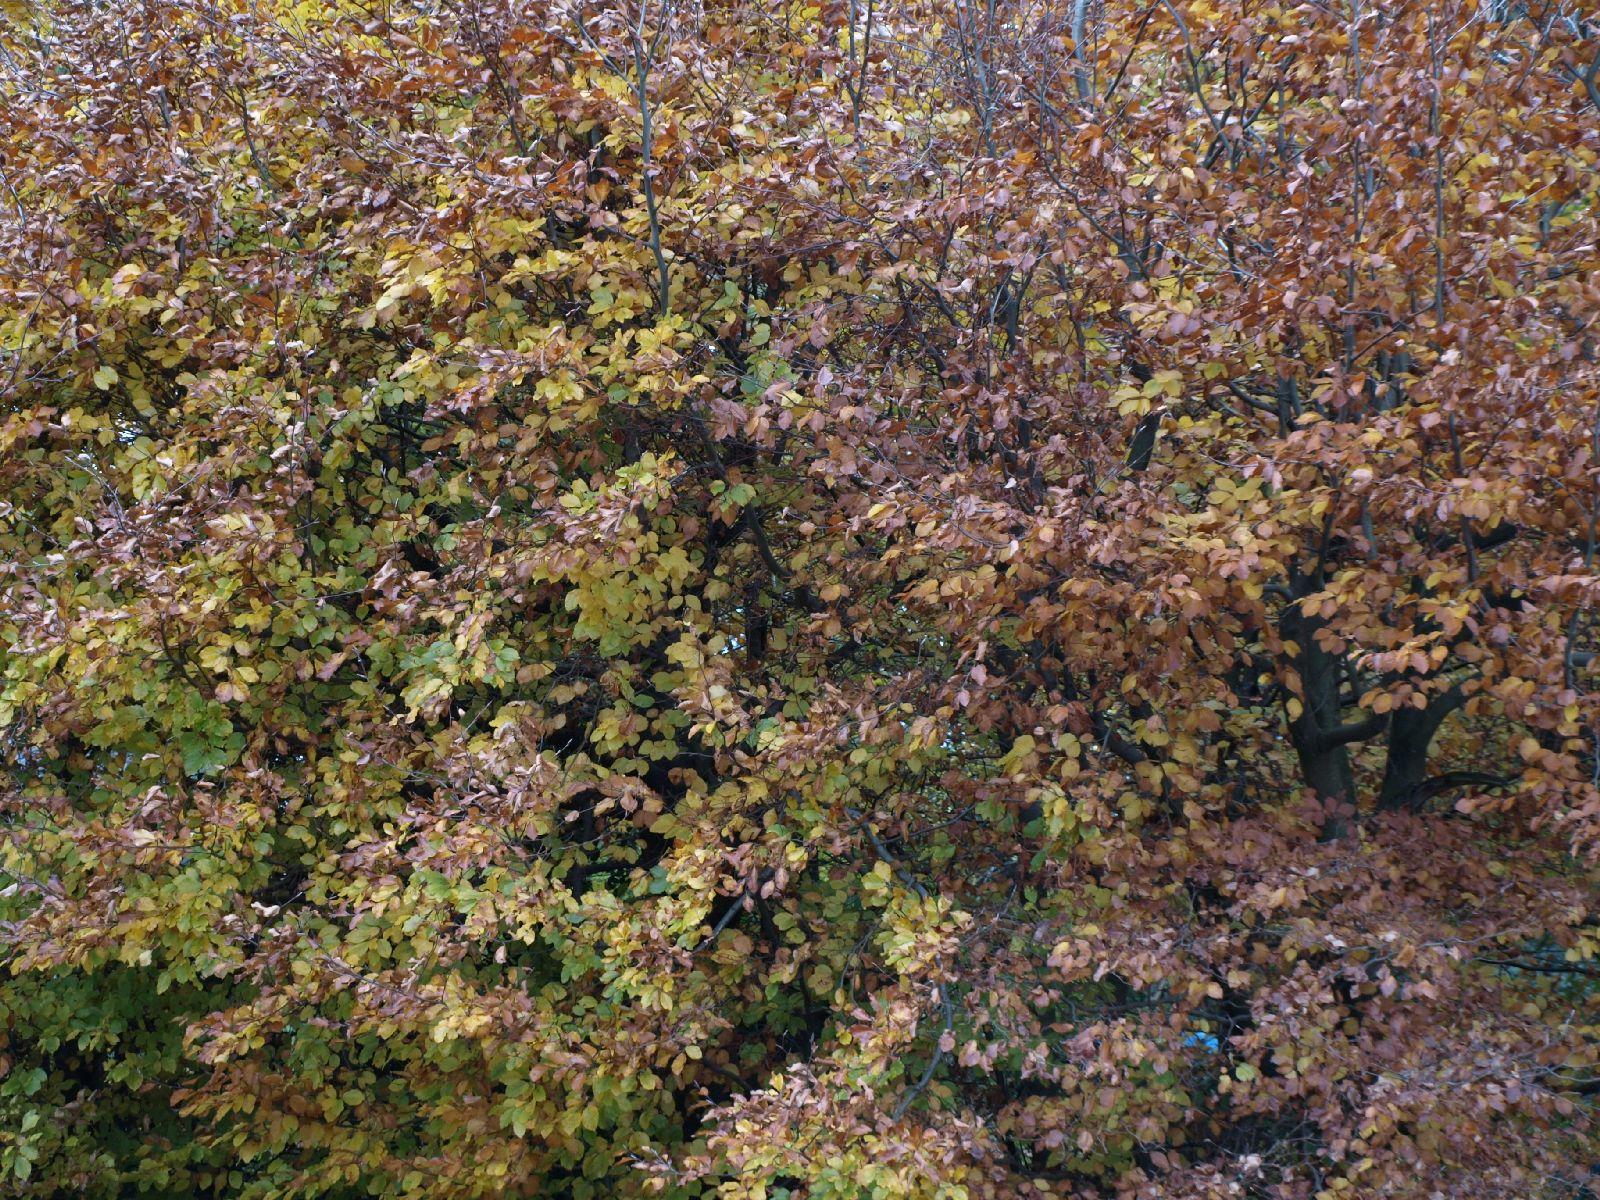 Pflanzen-Baum-Foto_Textur_B_PB026432